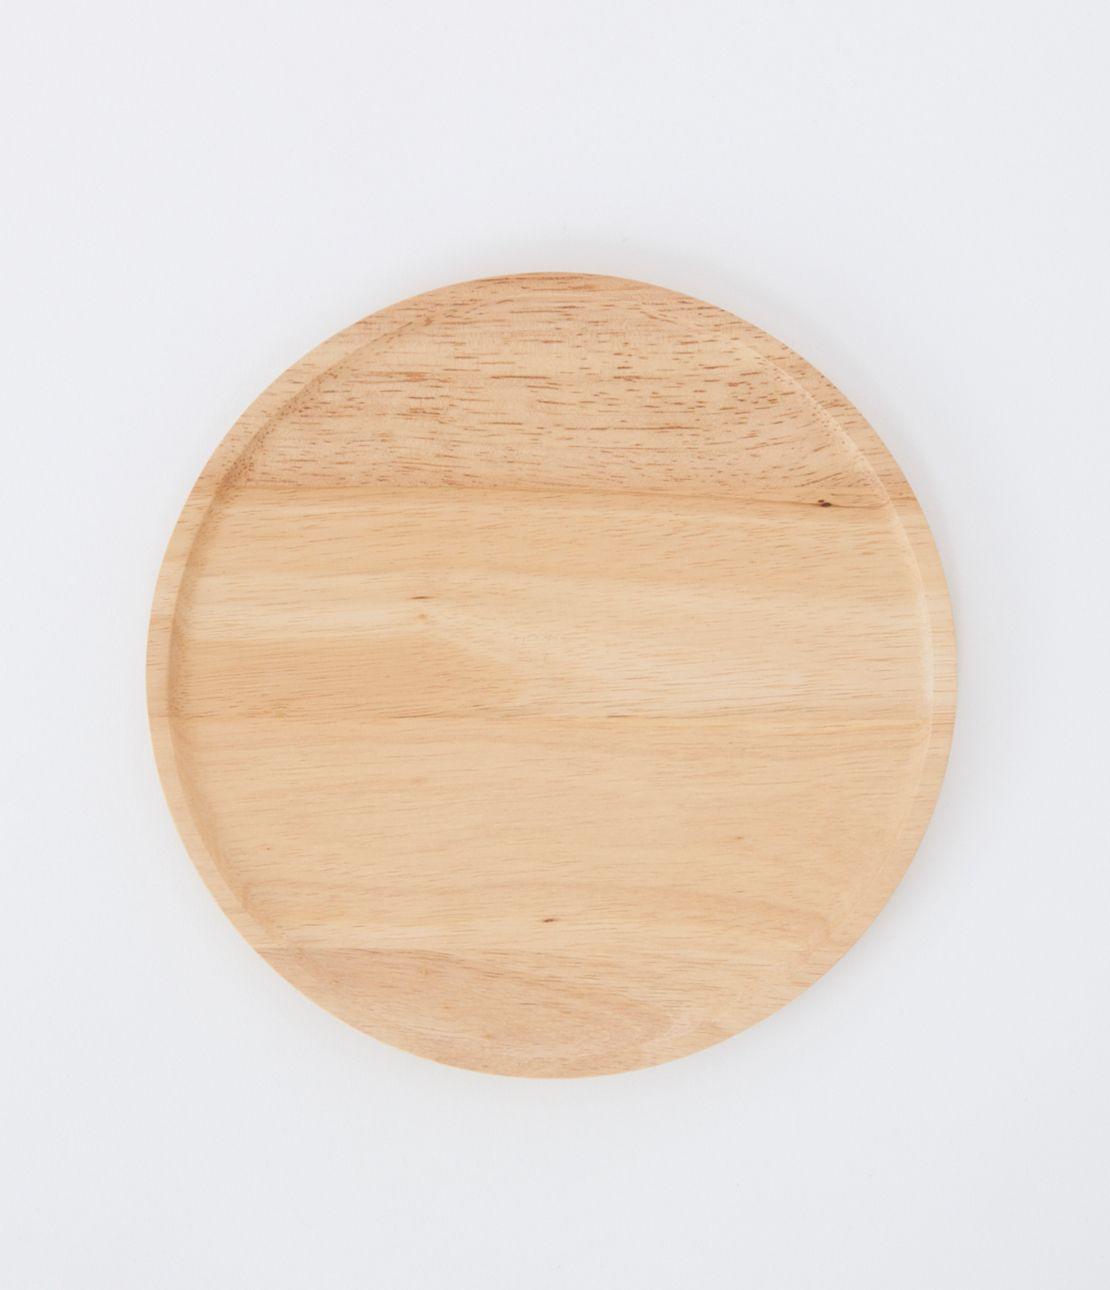 ACACIA (R) ROUND PLATE